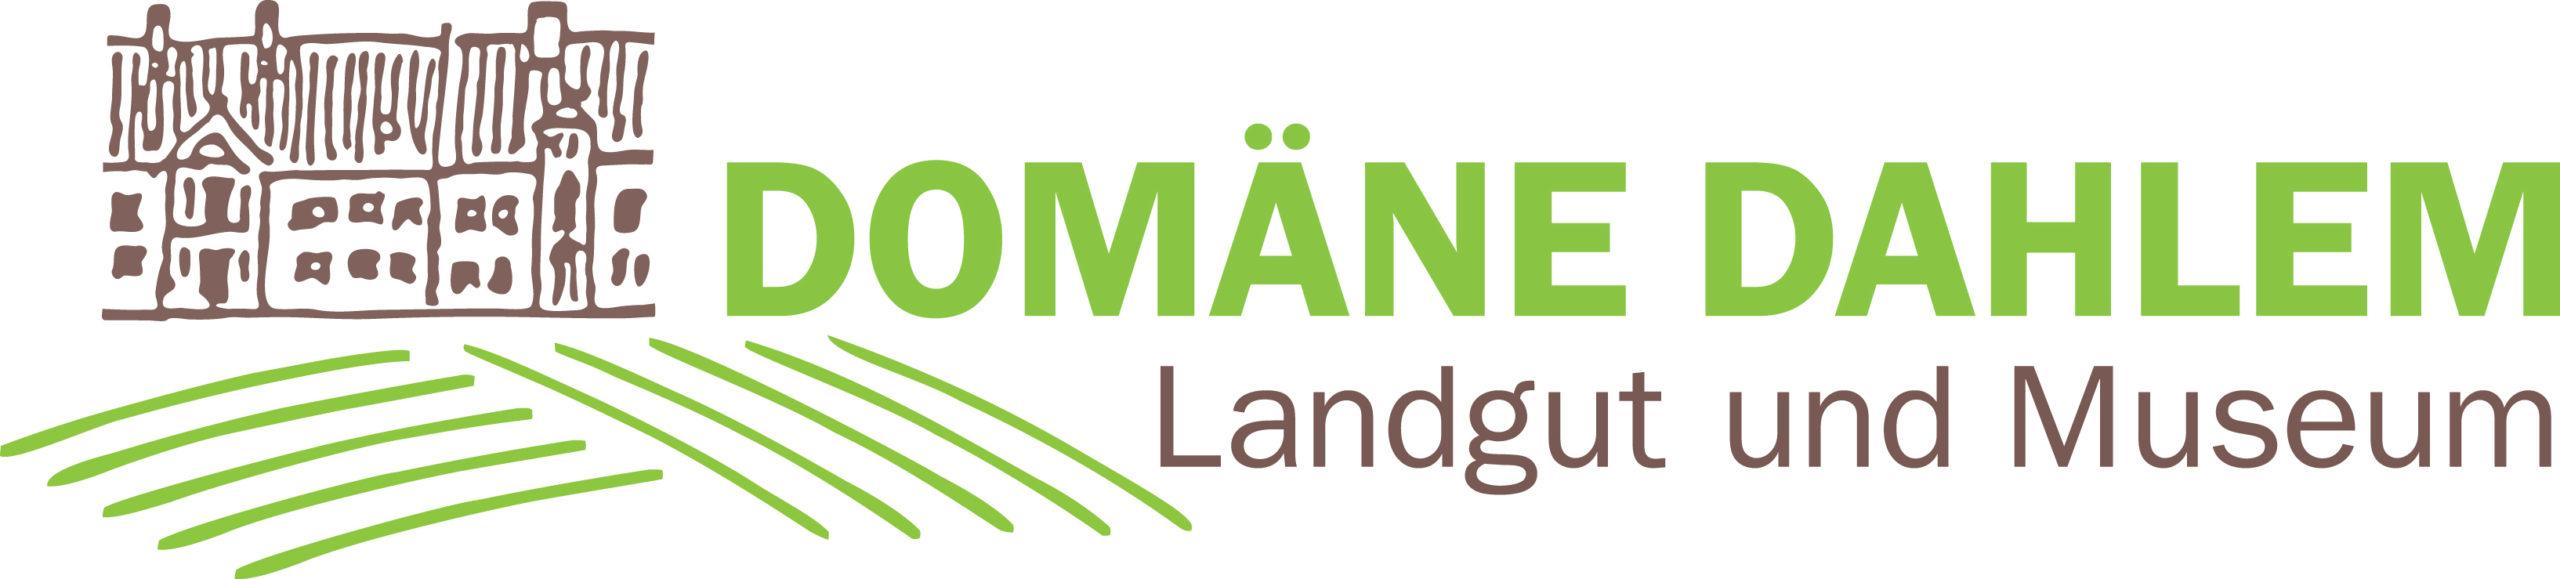 Logo Domäne Dahlem